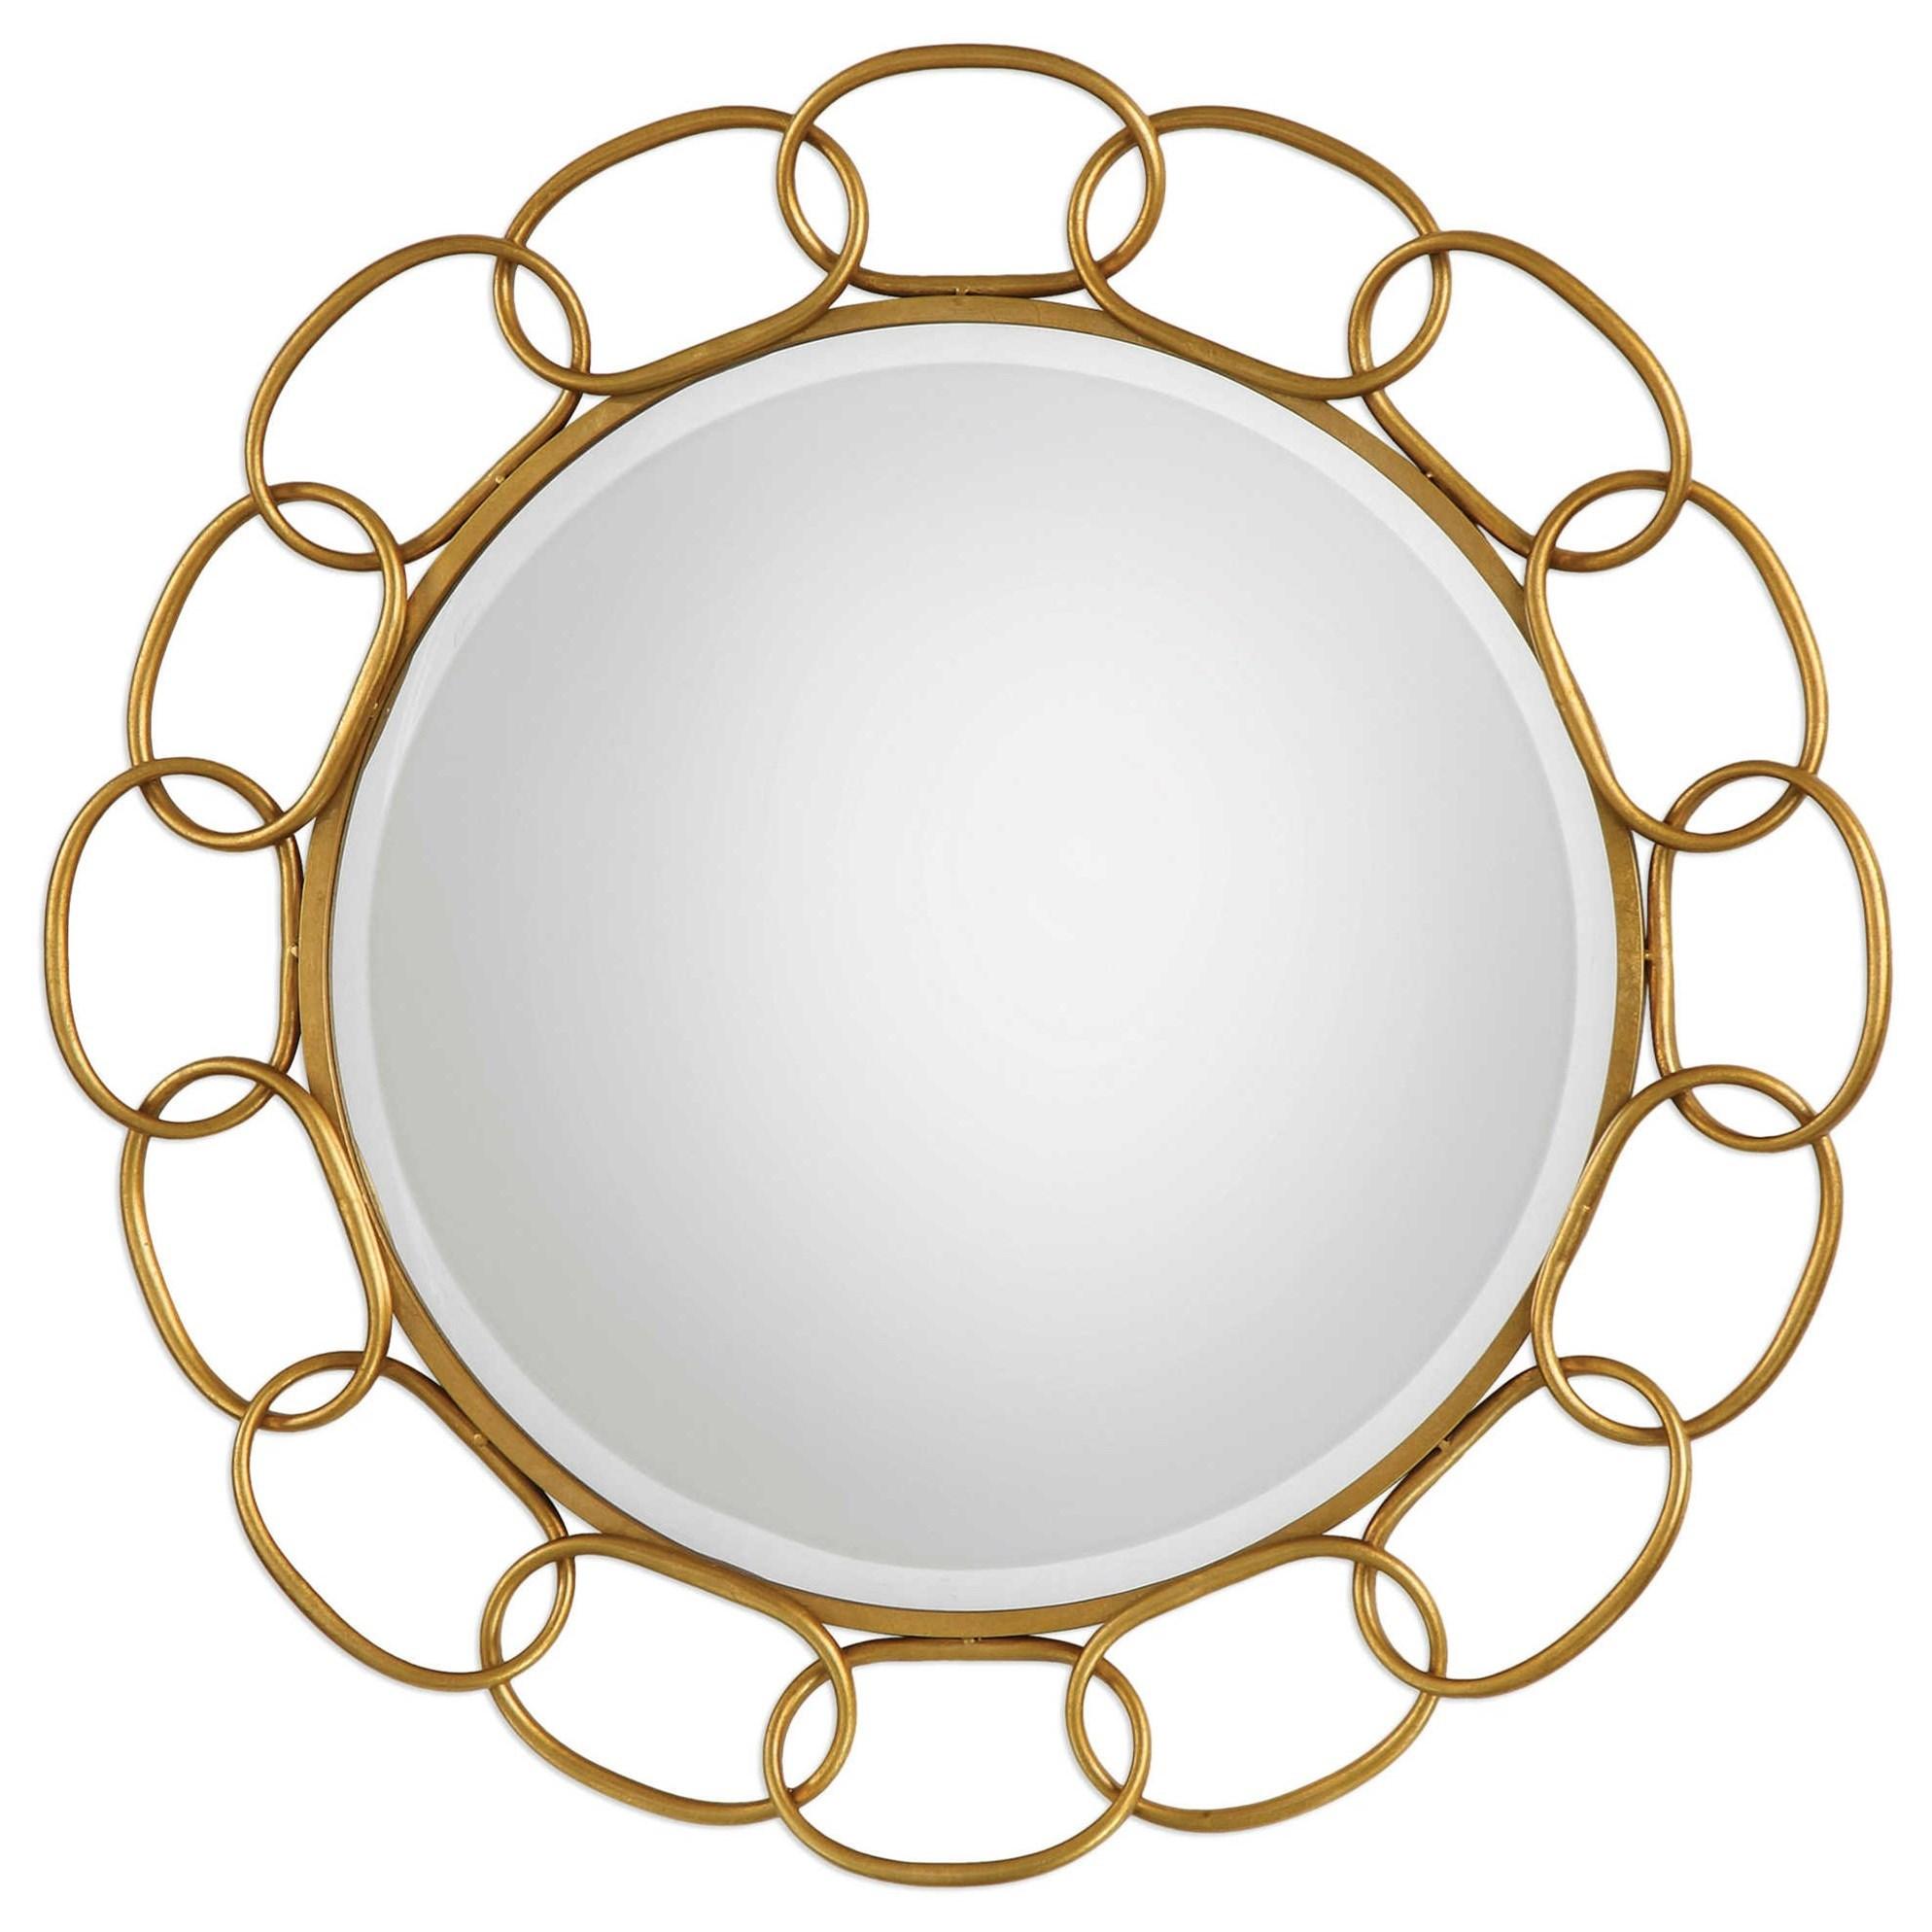 Uttermost MirrorsCirculus Gold Round Mirror ... Pictures Gallery